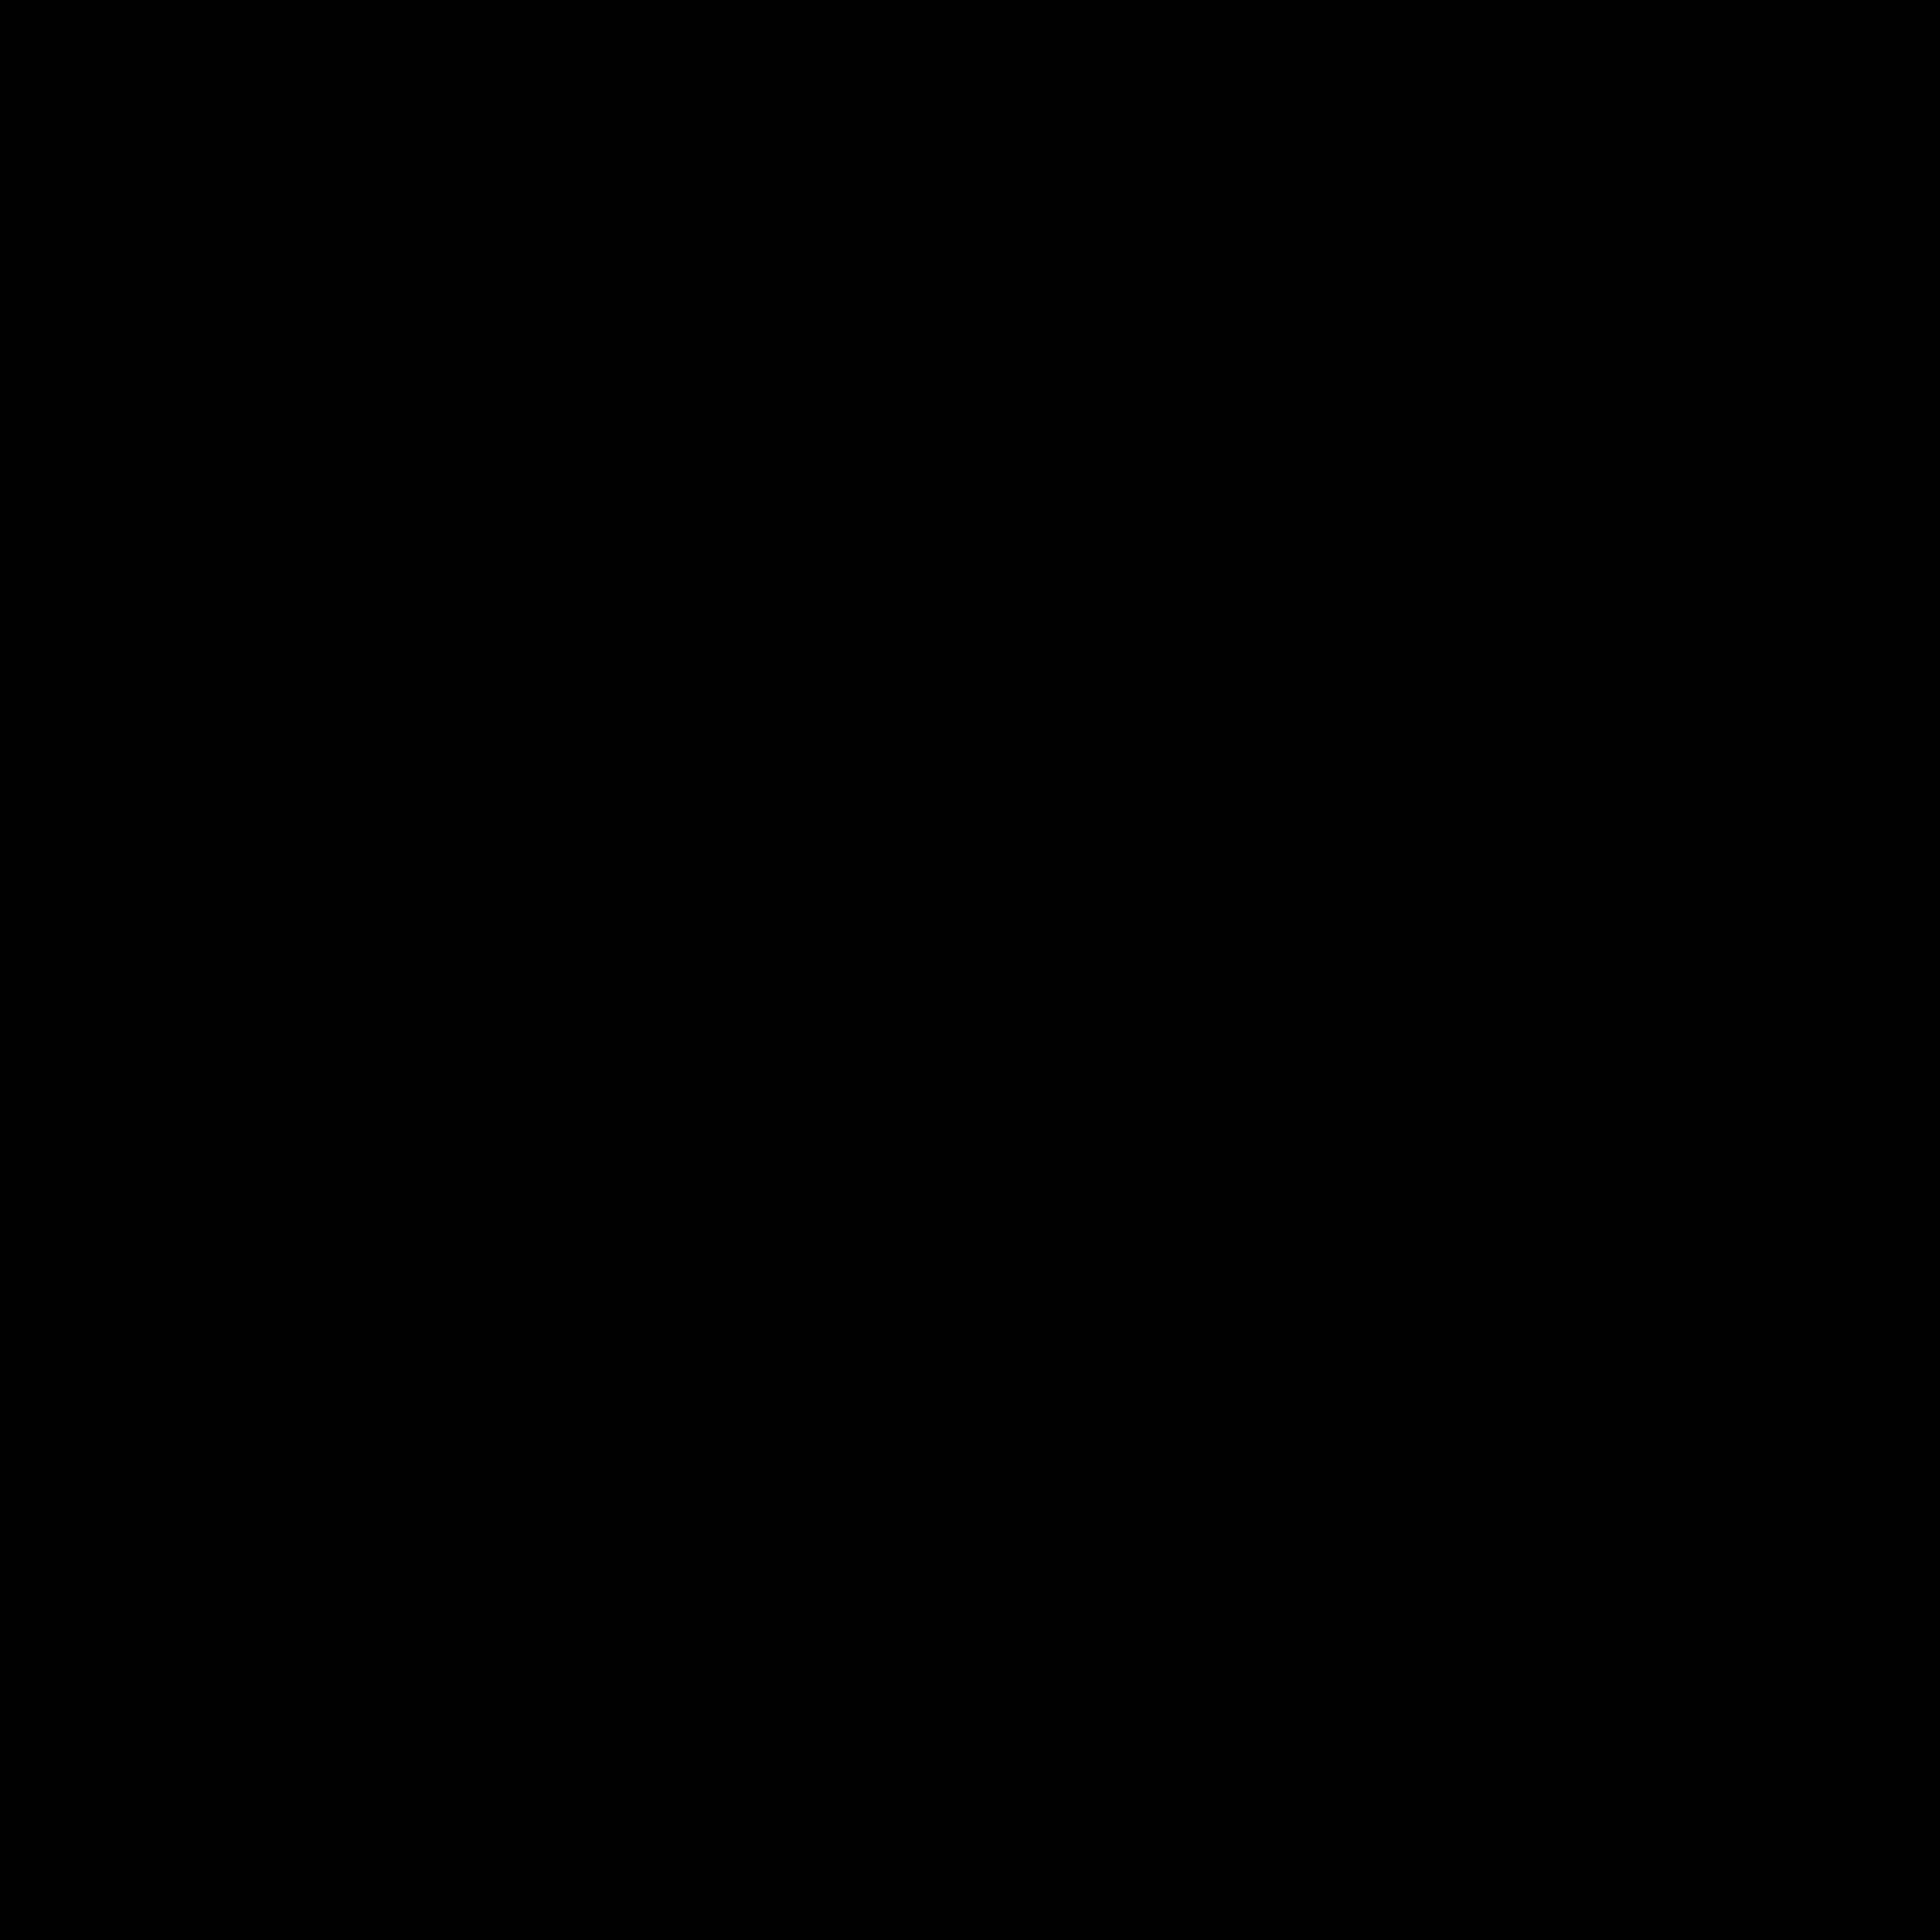 BFFF logo black.png